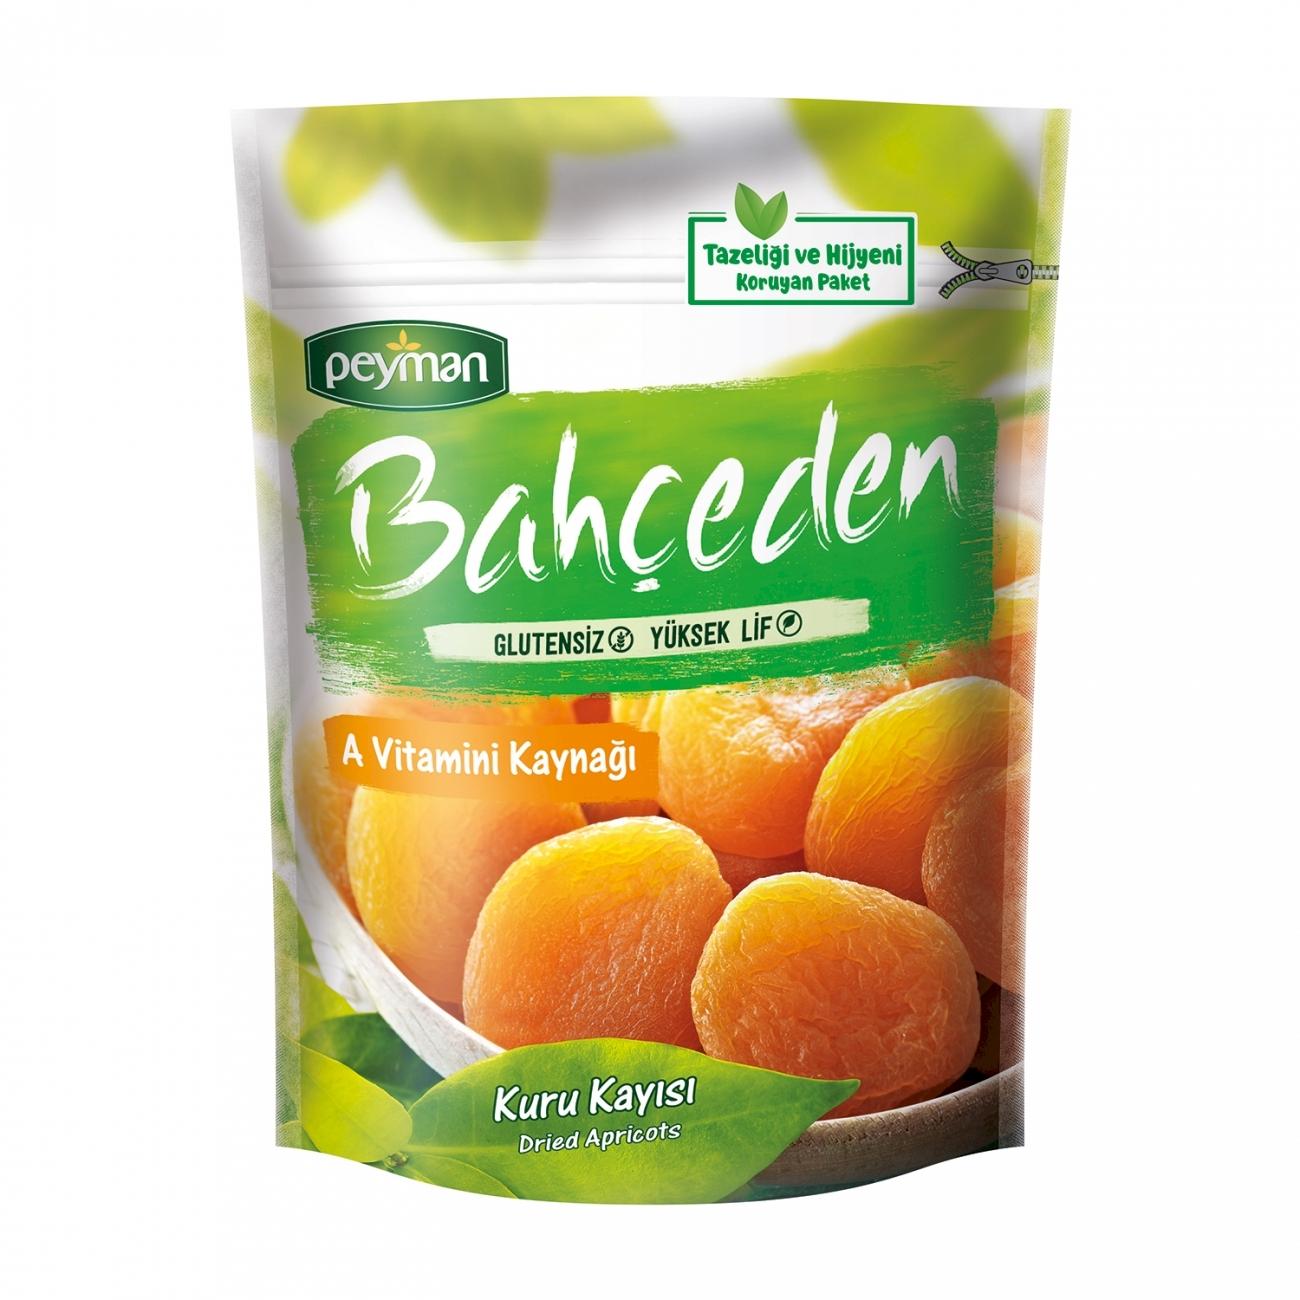 Peyman Bahceden Golden Apricot Gluten Free 200 gr